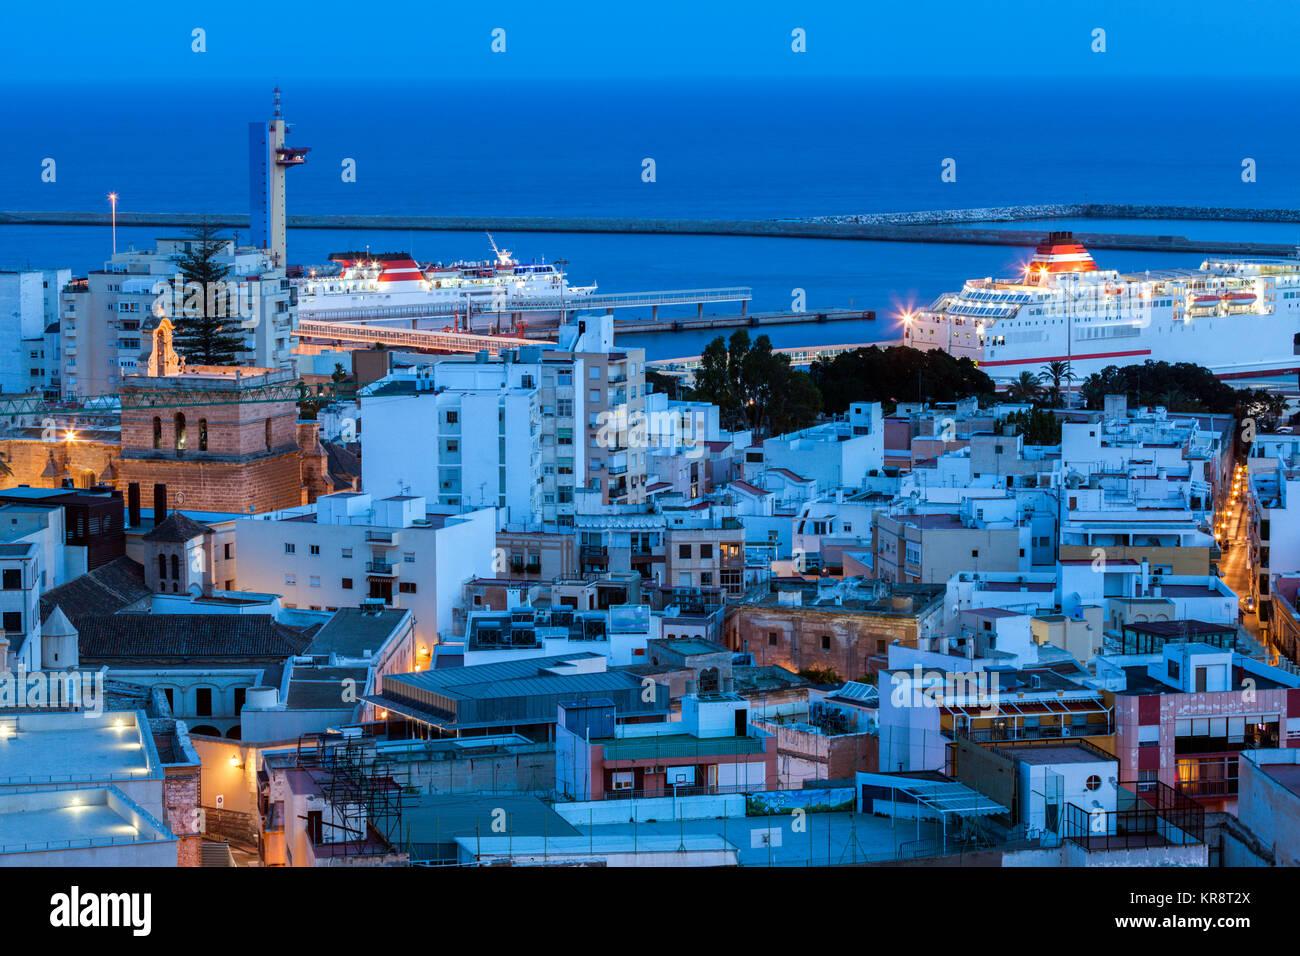 Spain, Andalusia, Almeria, Cityscape with sea at dusk - Stock Image